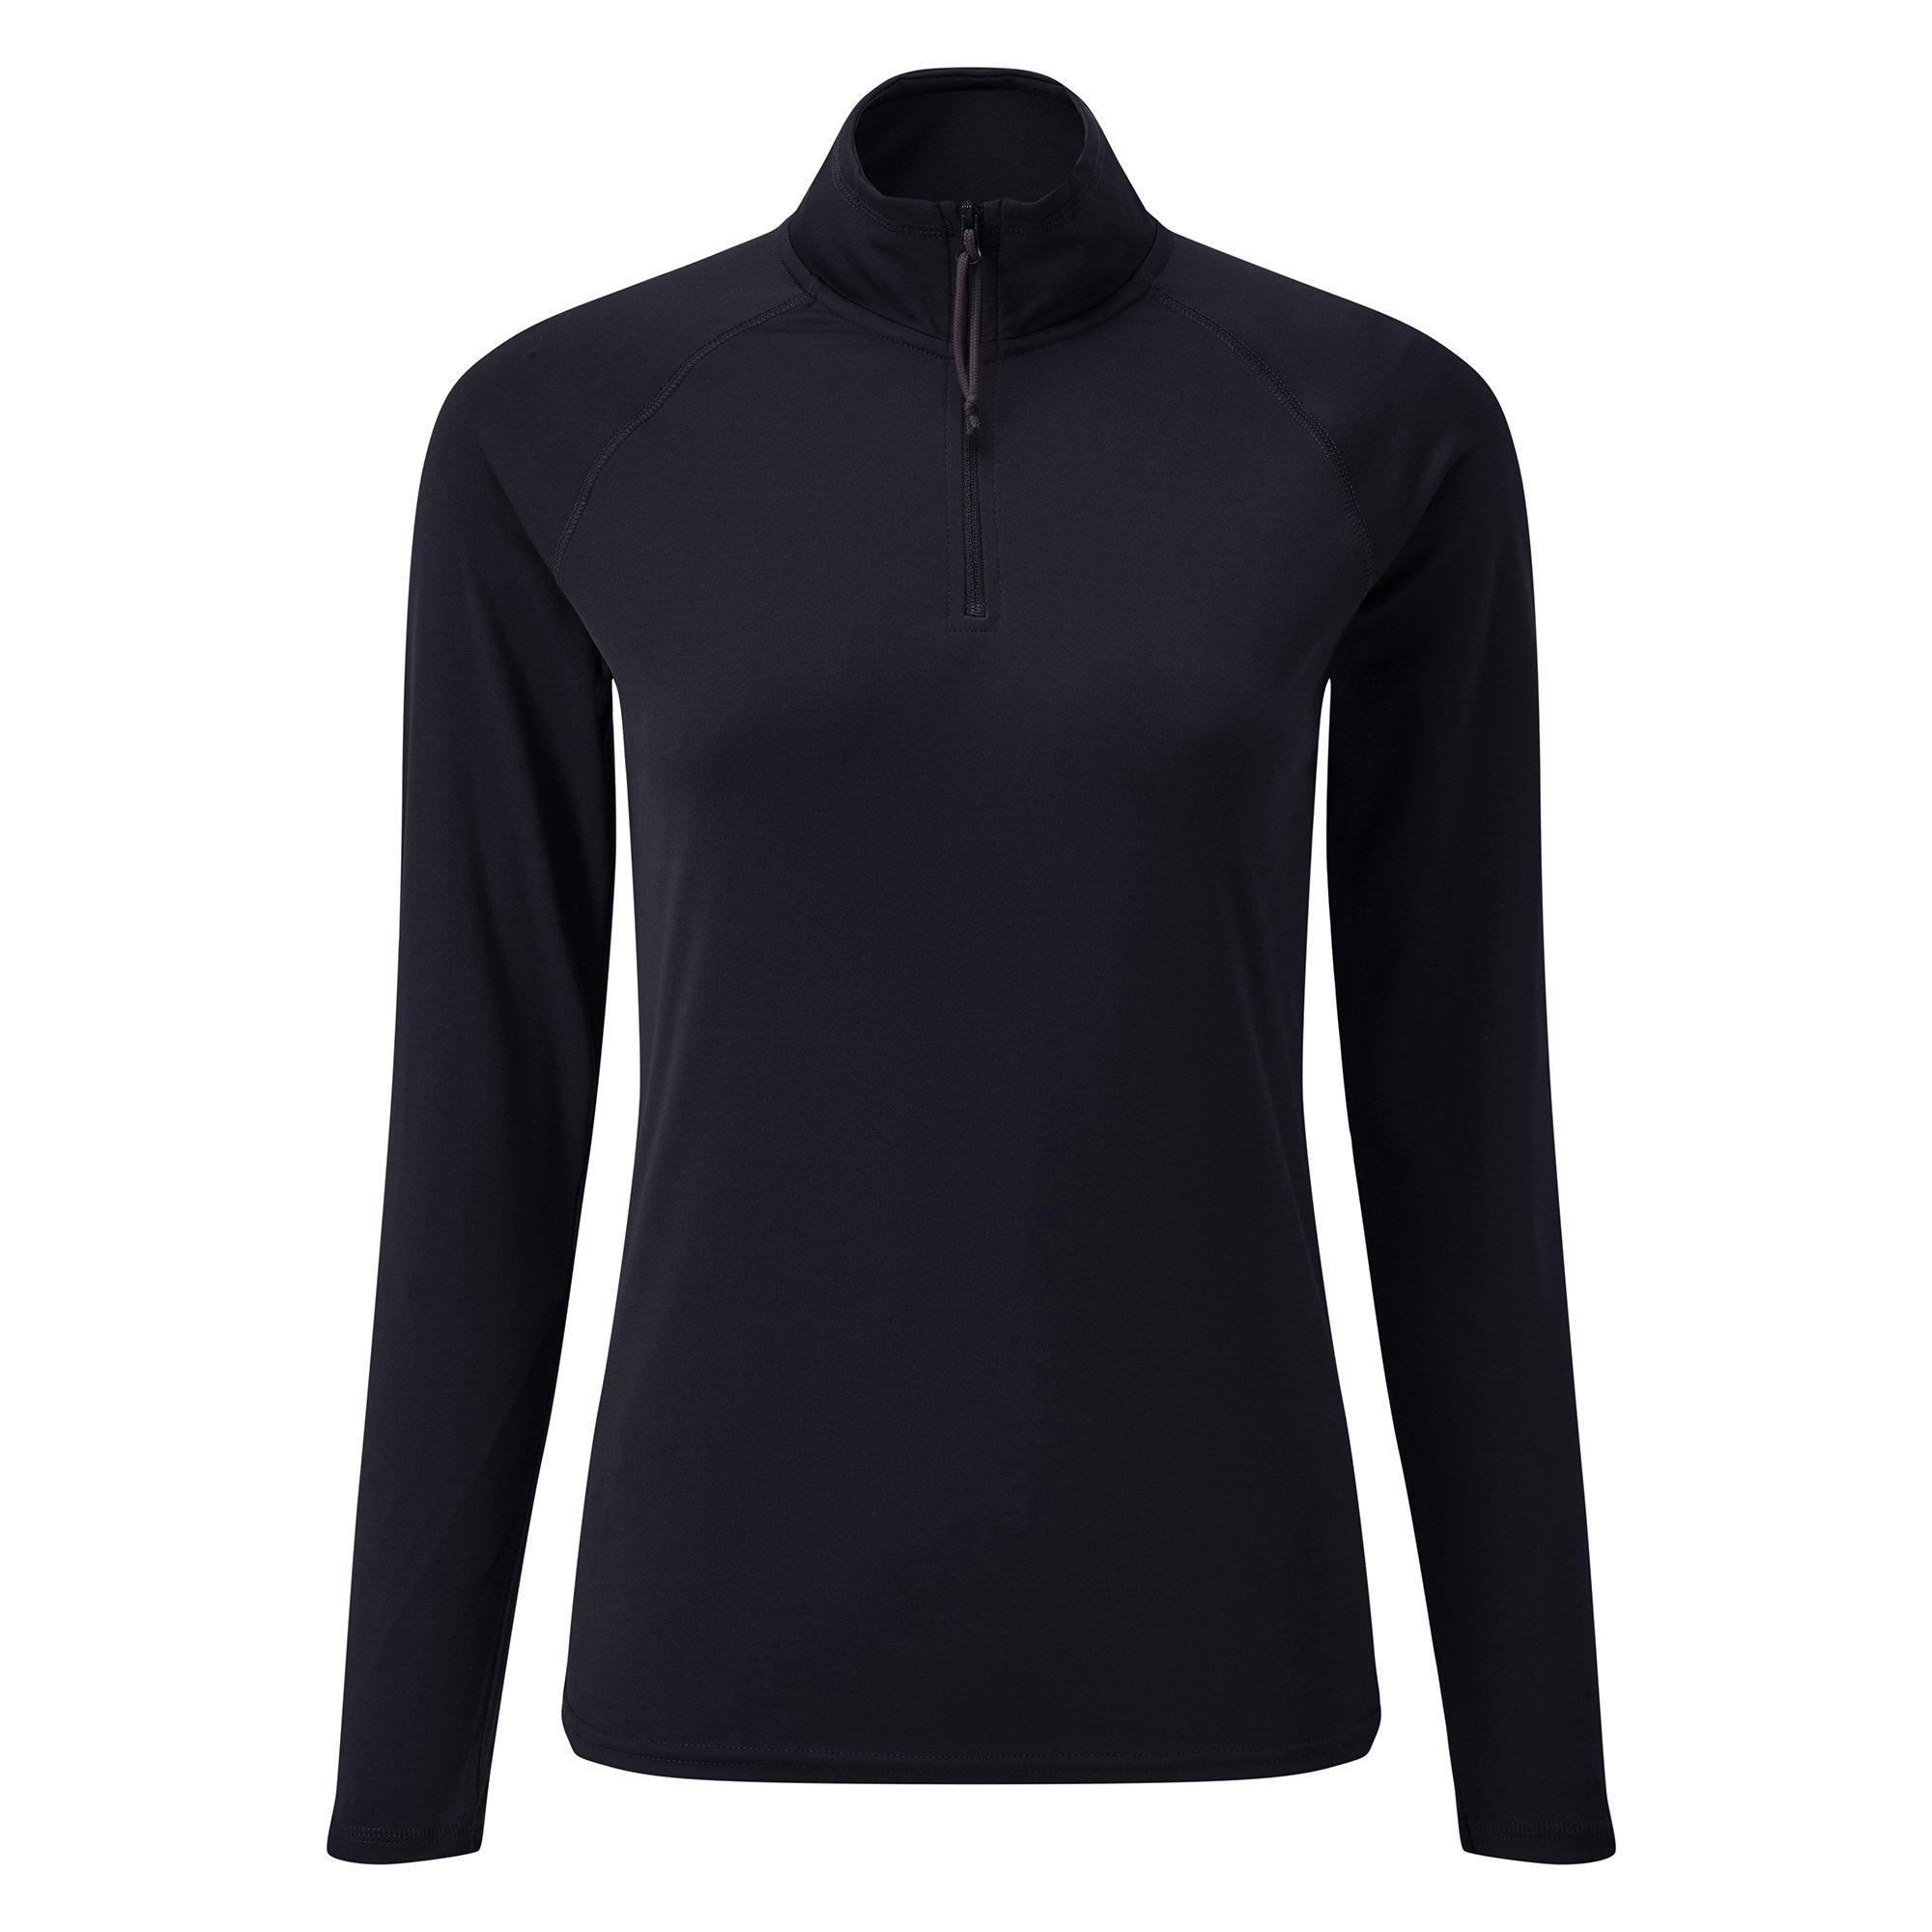 Women's UV Tec Zip Tee - Long Sleeve - UV009W-NAV06-1.jpg